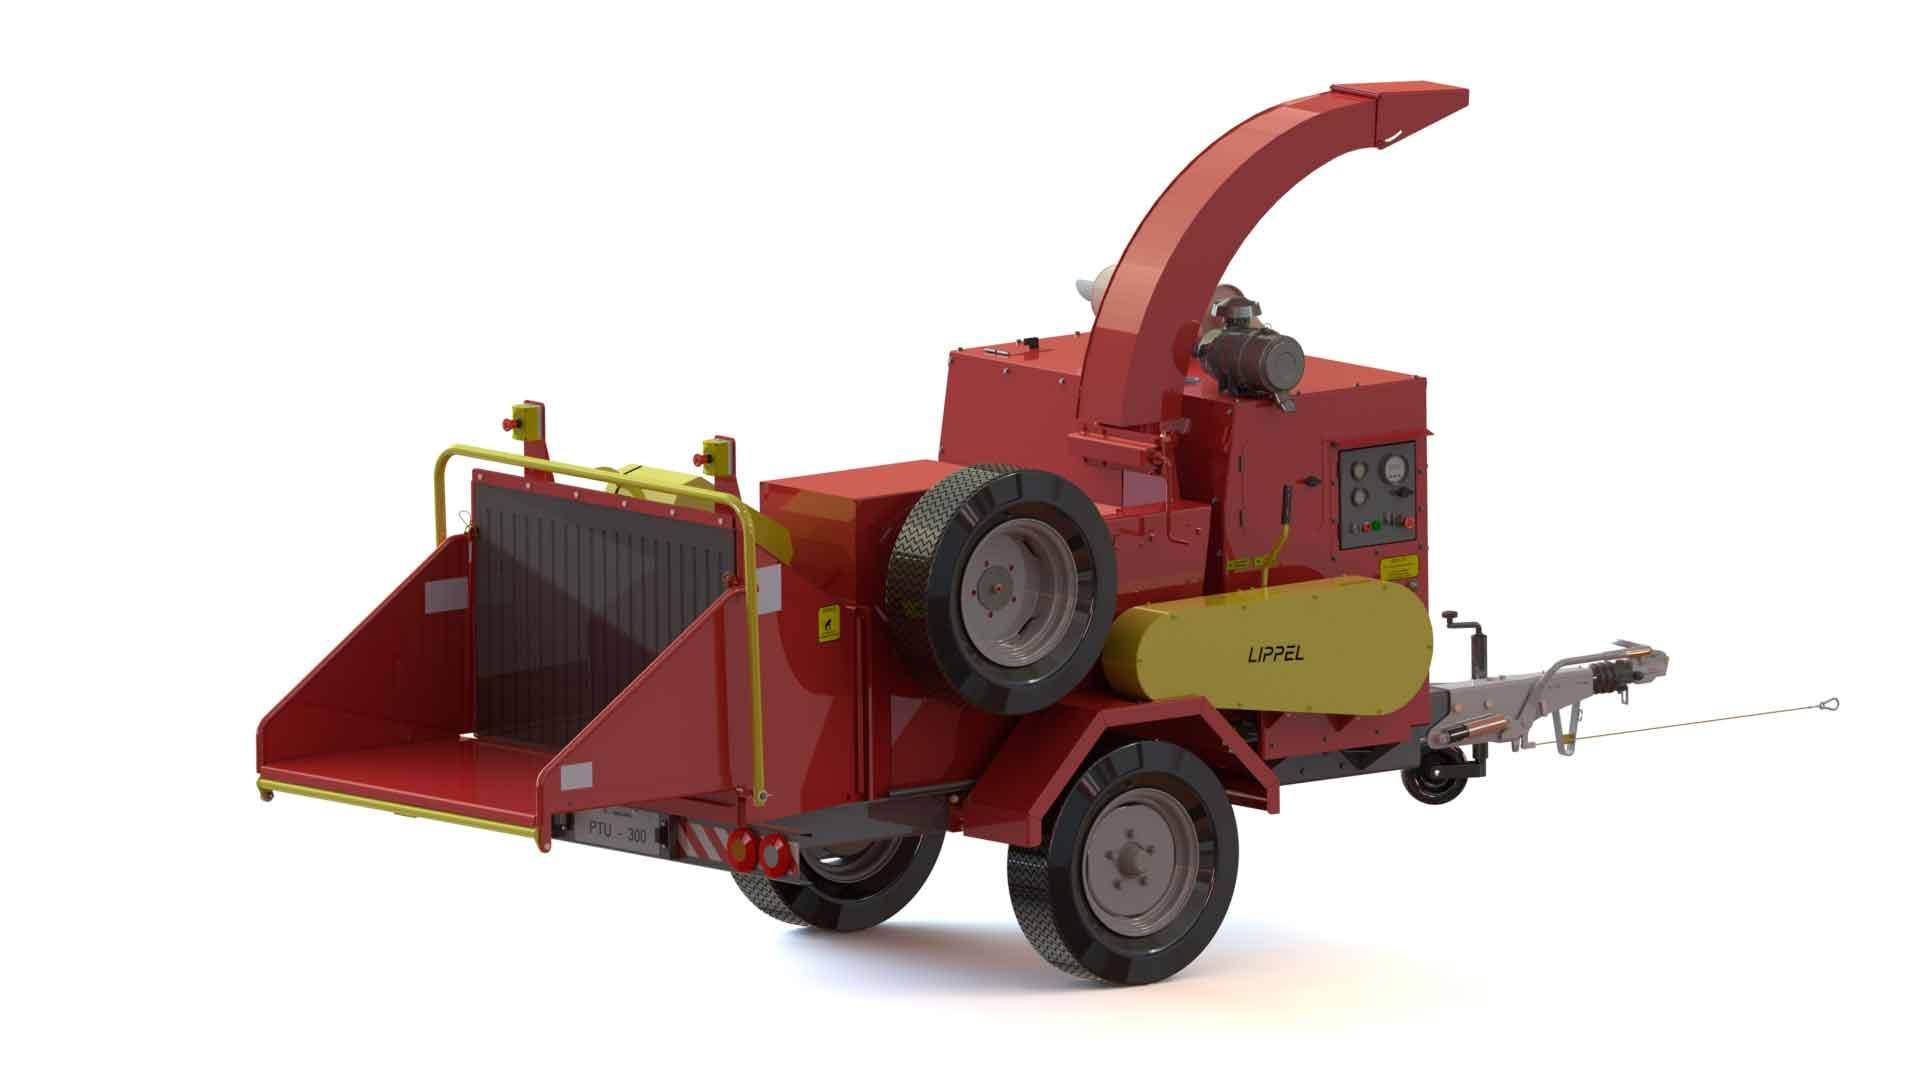 Ramas astilladora / desintegradora PTL 350 E ideal para astillado de ramas, troncos y arbustos